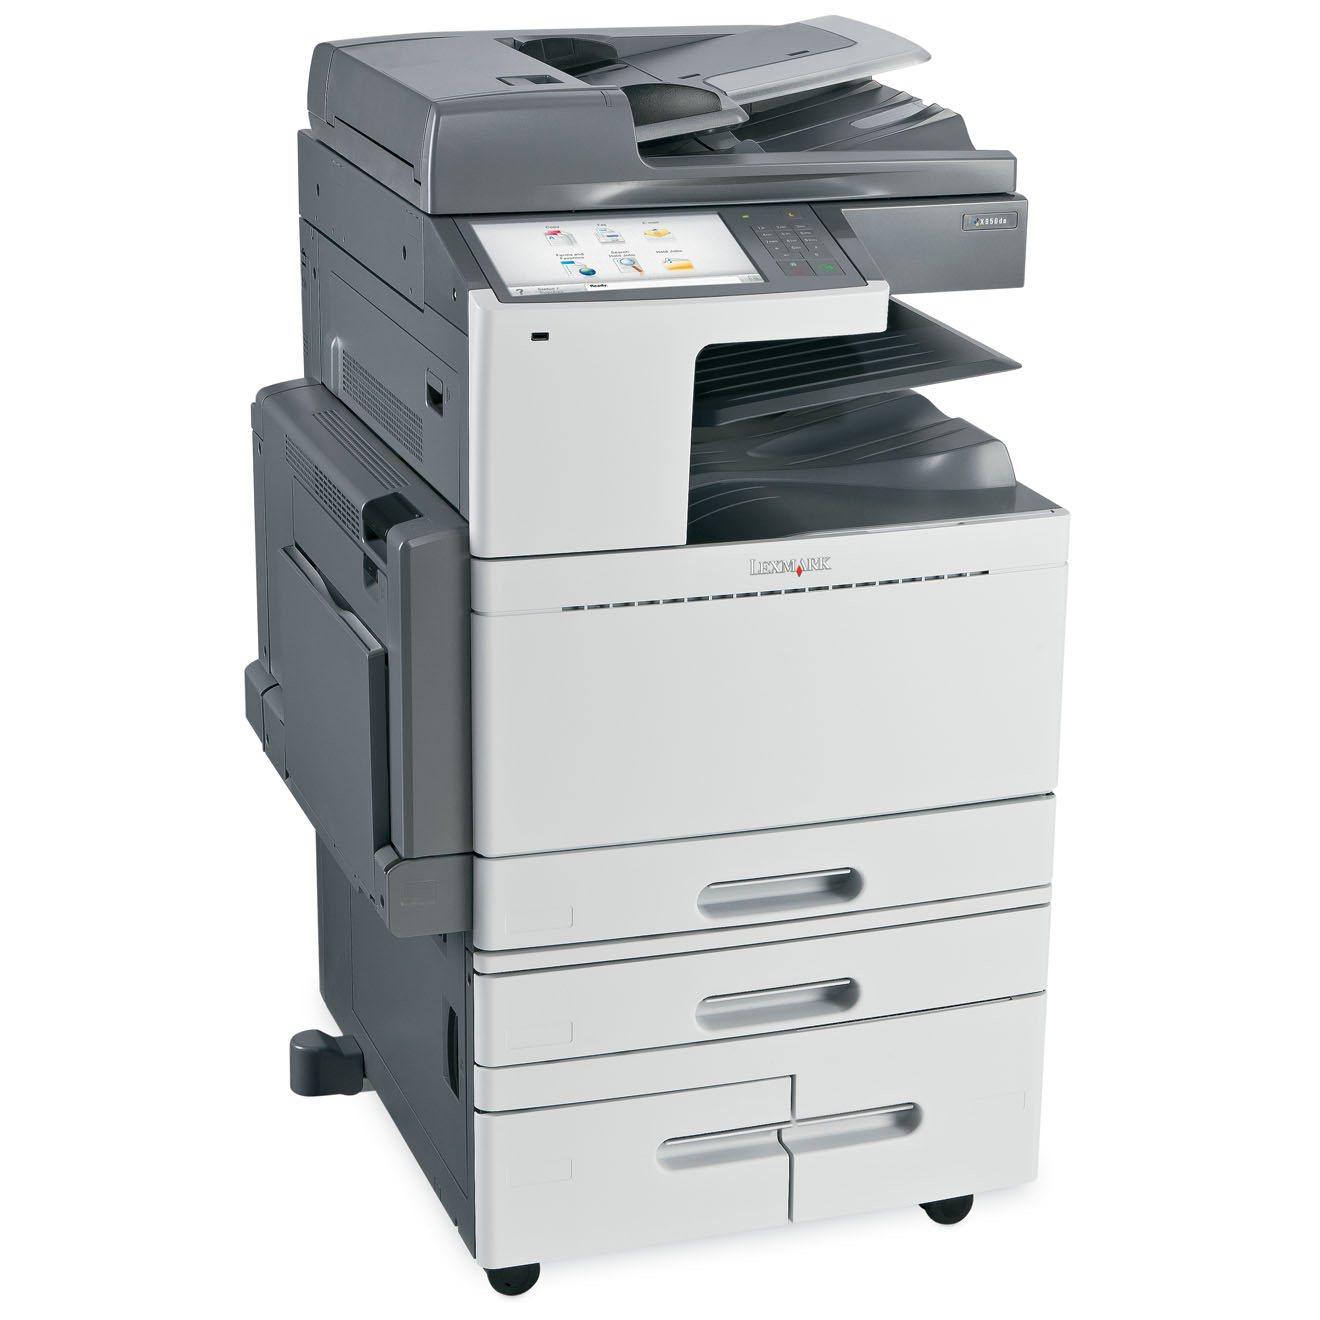 Lexmark X954dhe LED Multifunction Printer